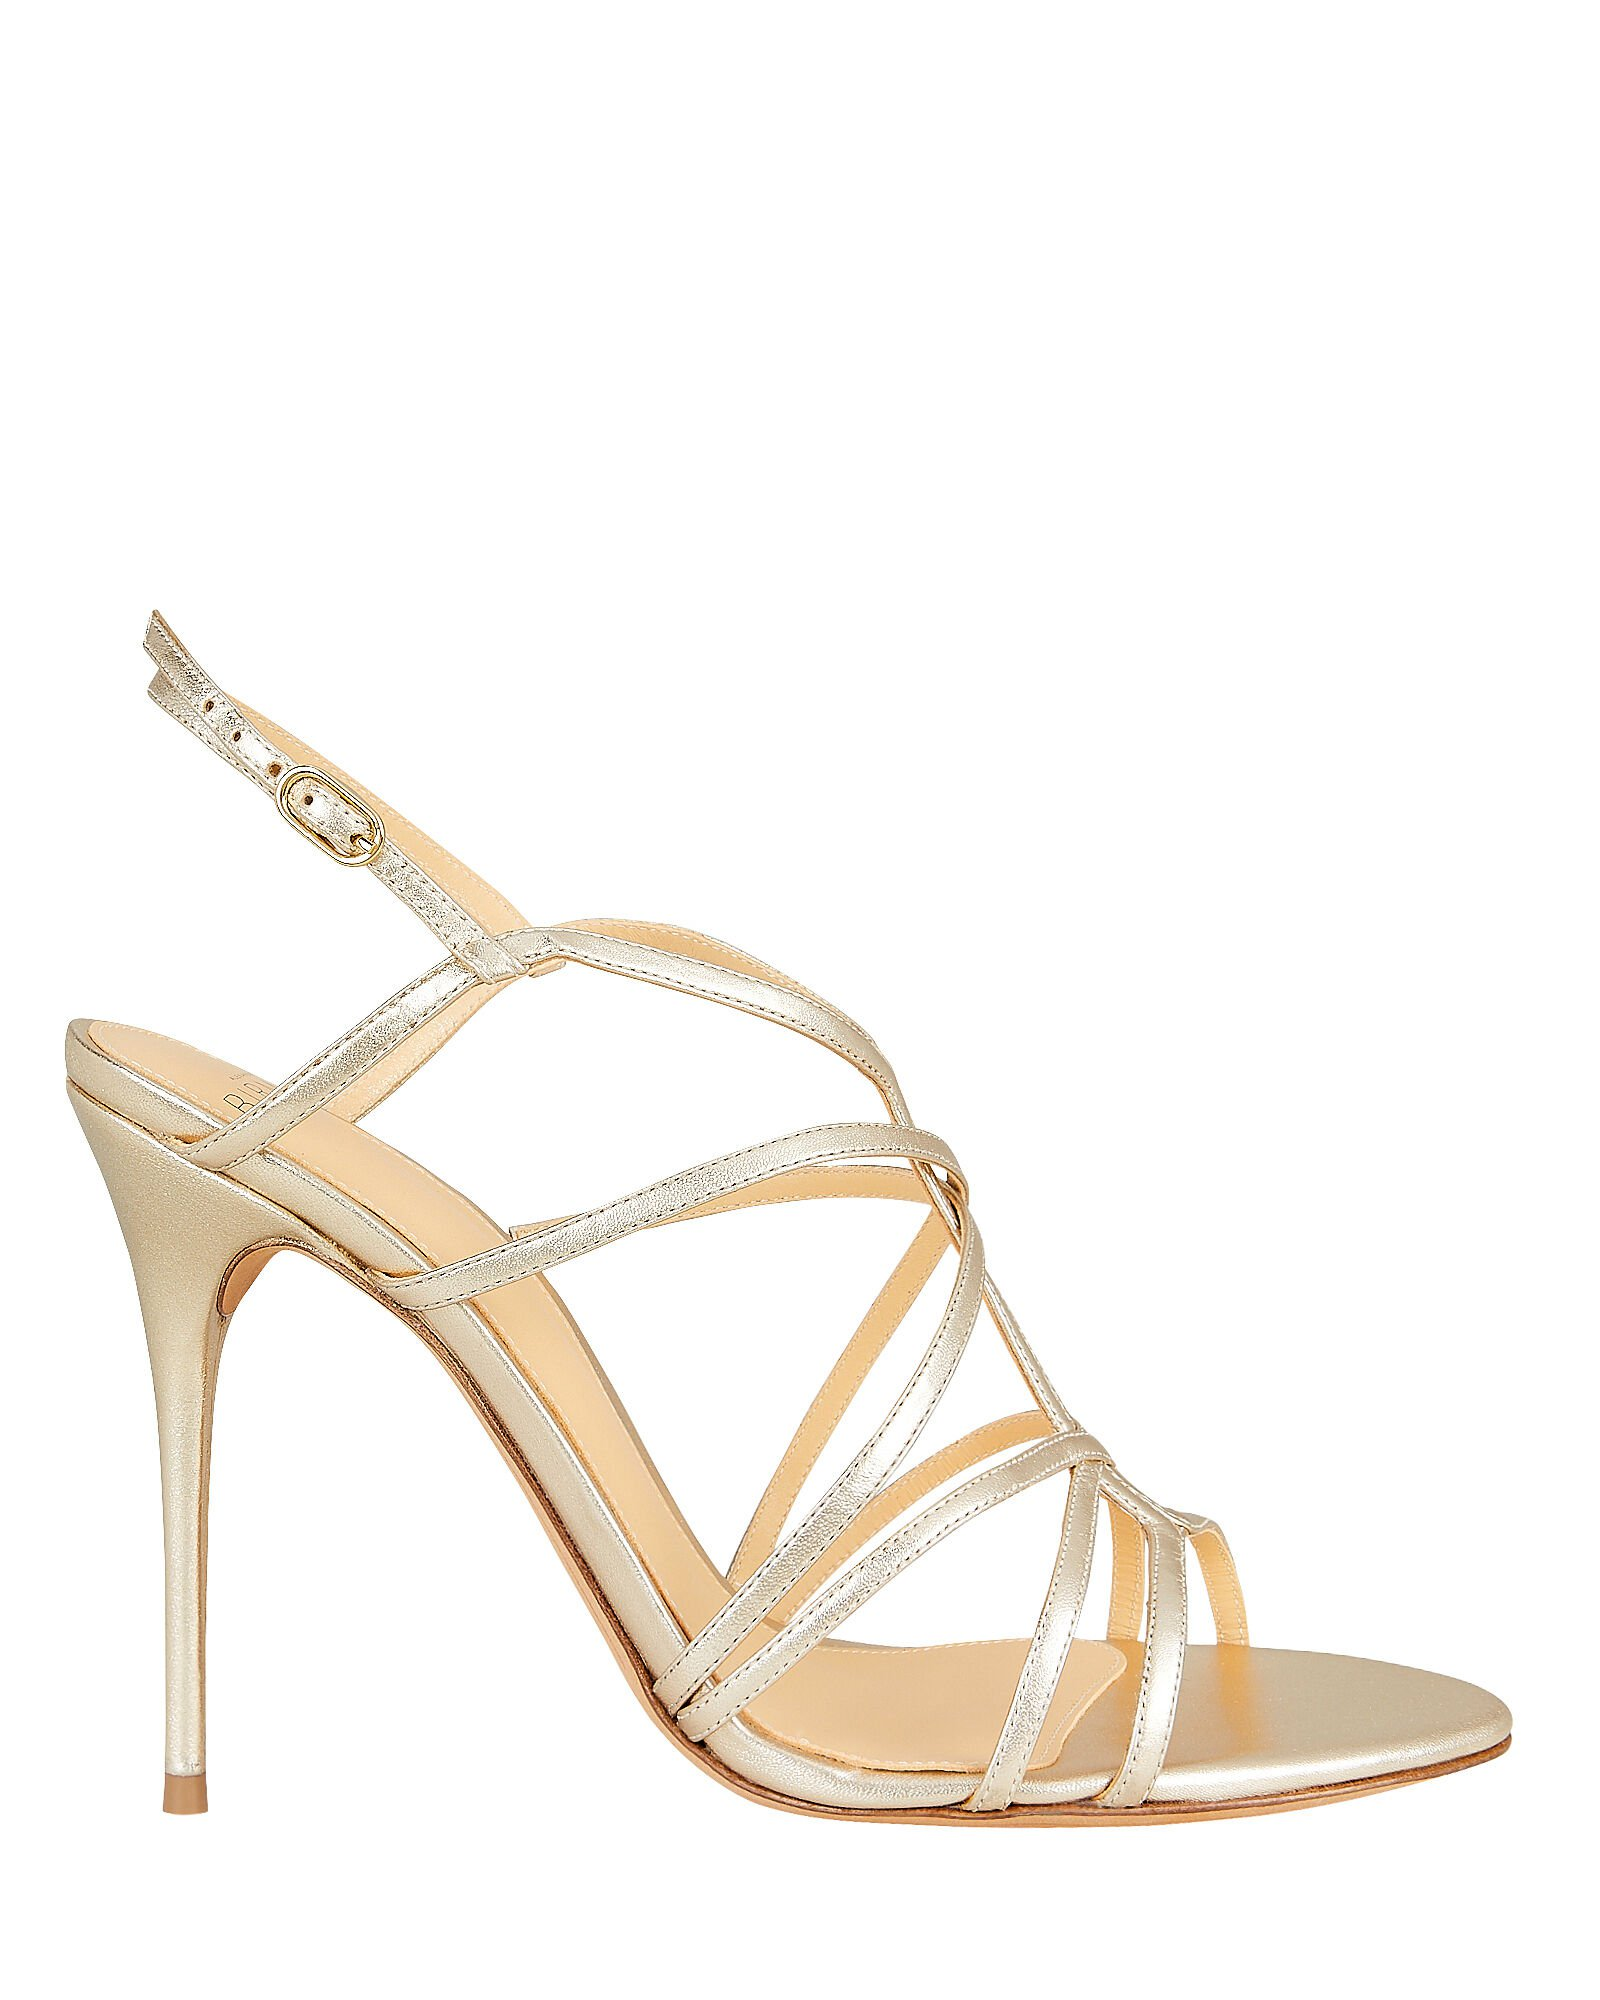 Emma 100 Leather Sandals | INTERMIX®